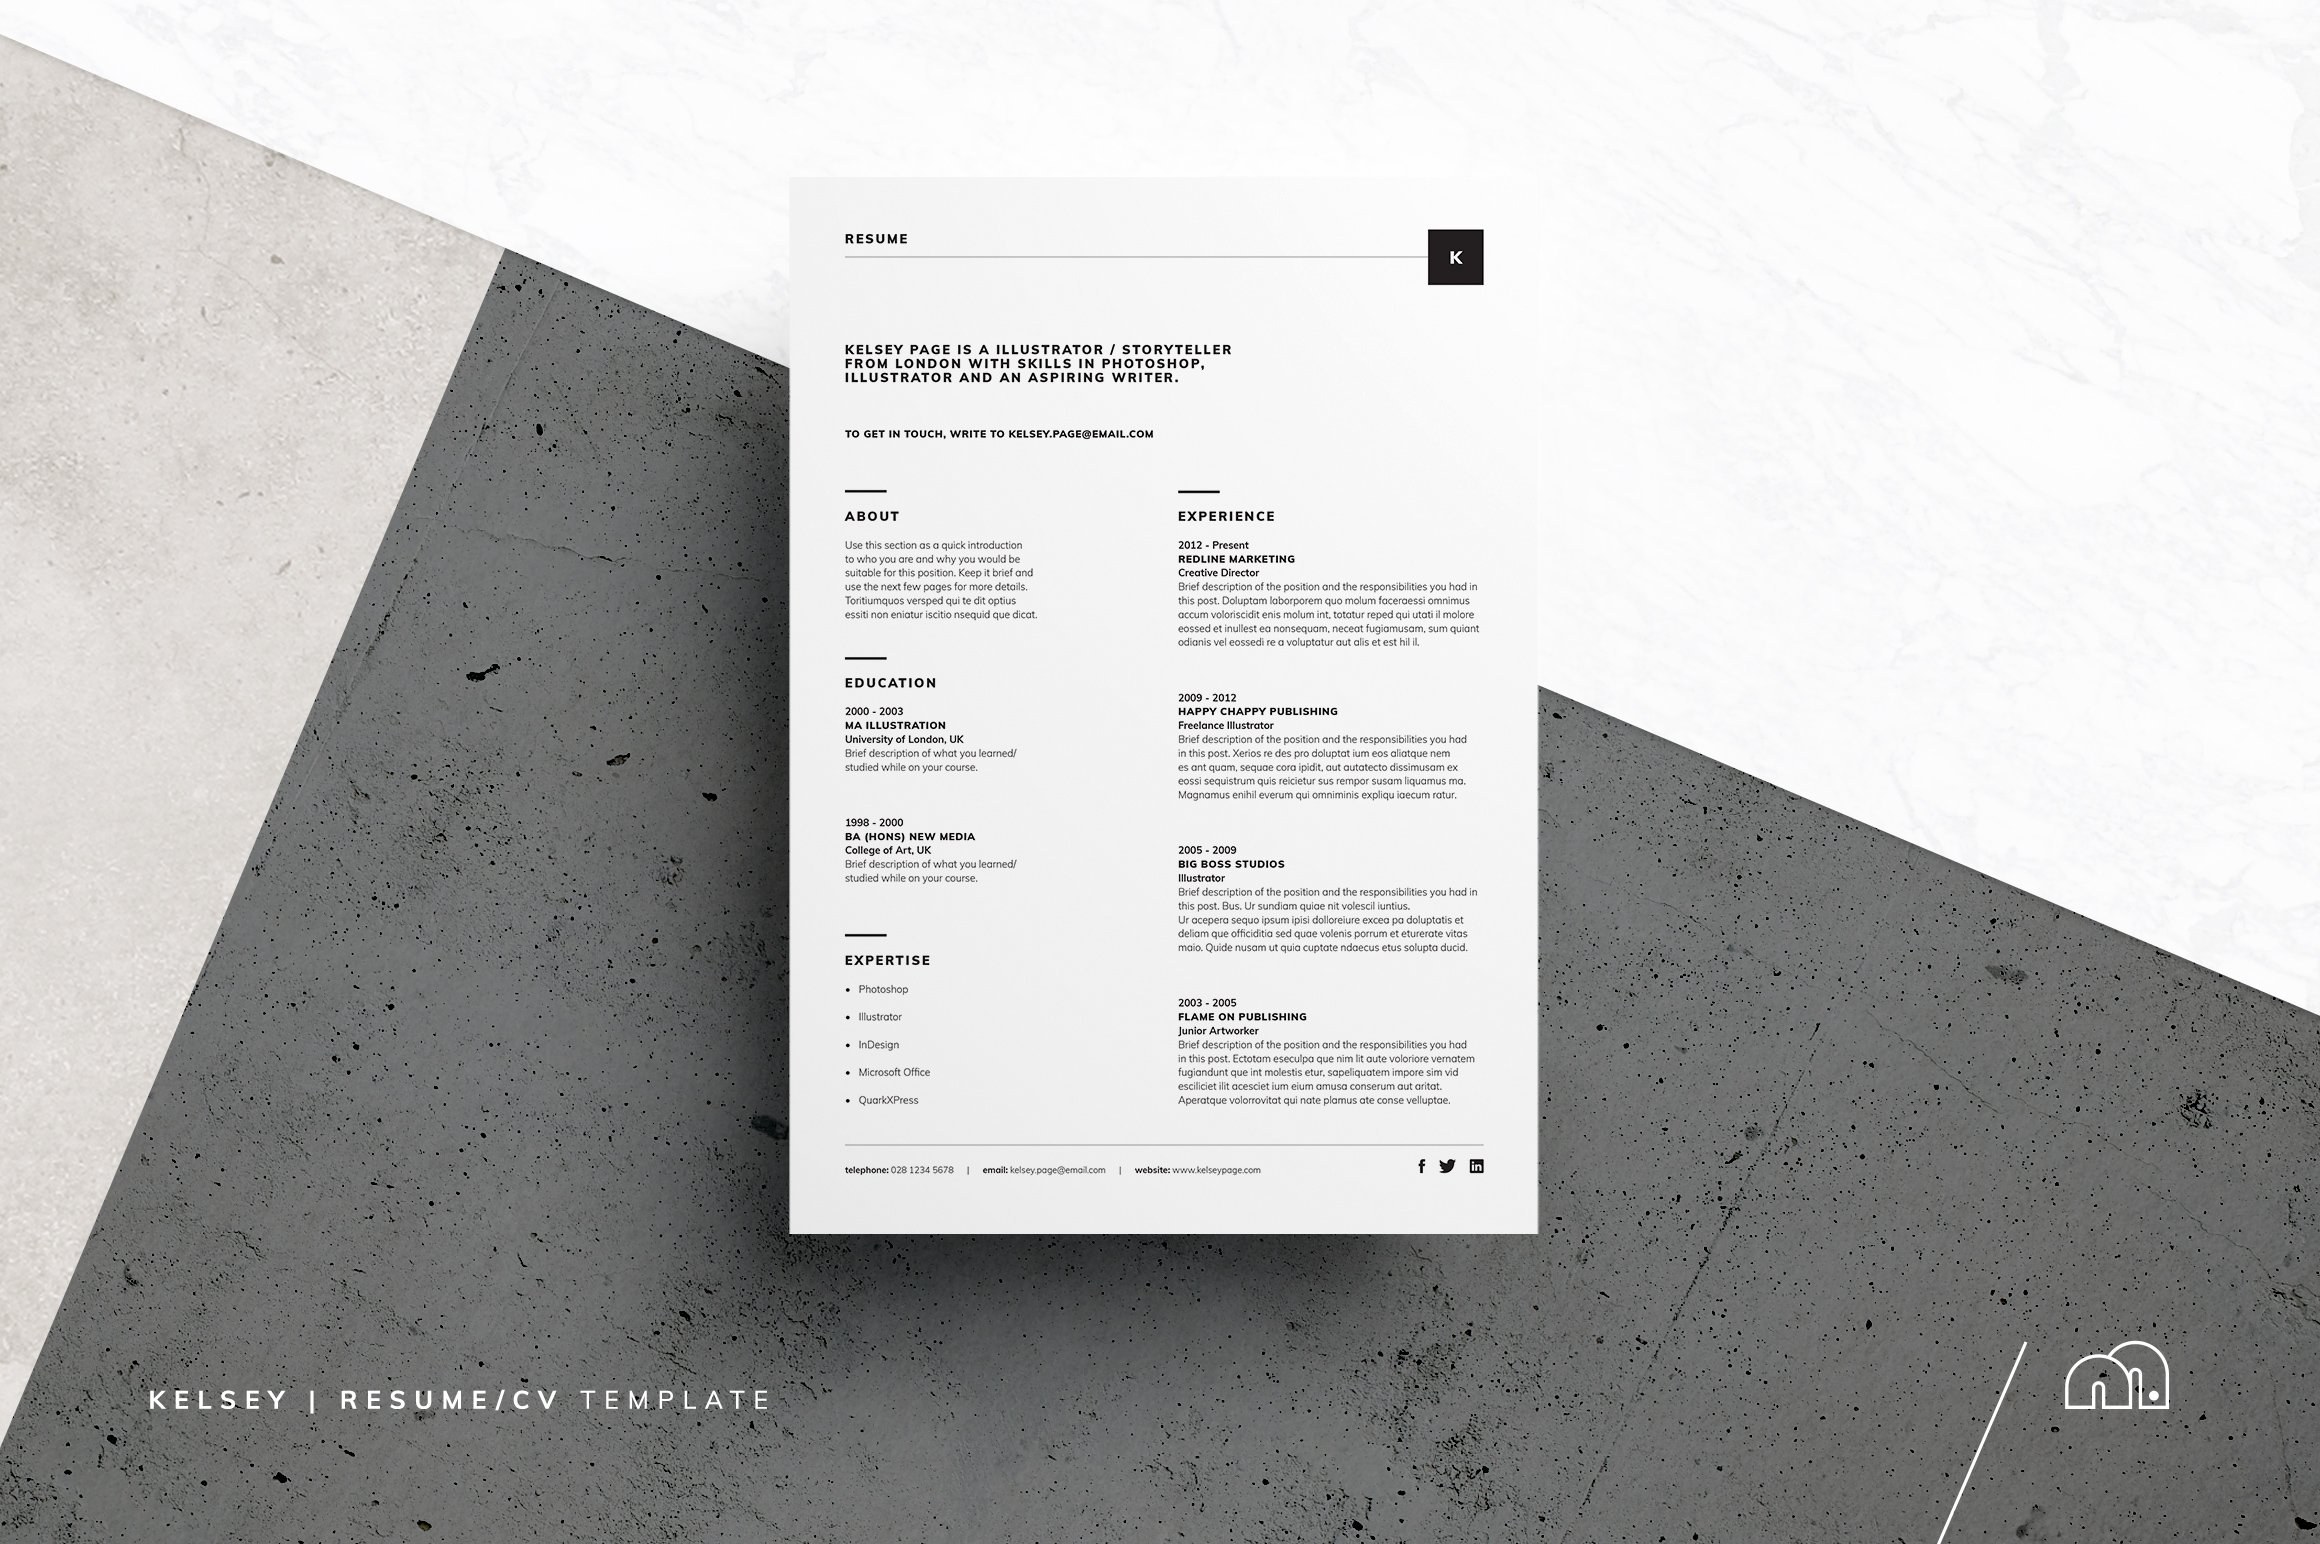 Resume/CV - Kelsey ~ Resume Templates ~ Creative Market